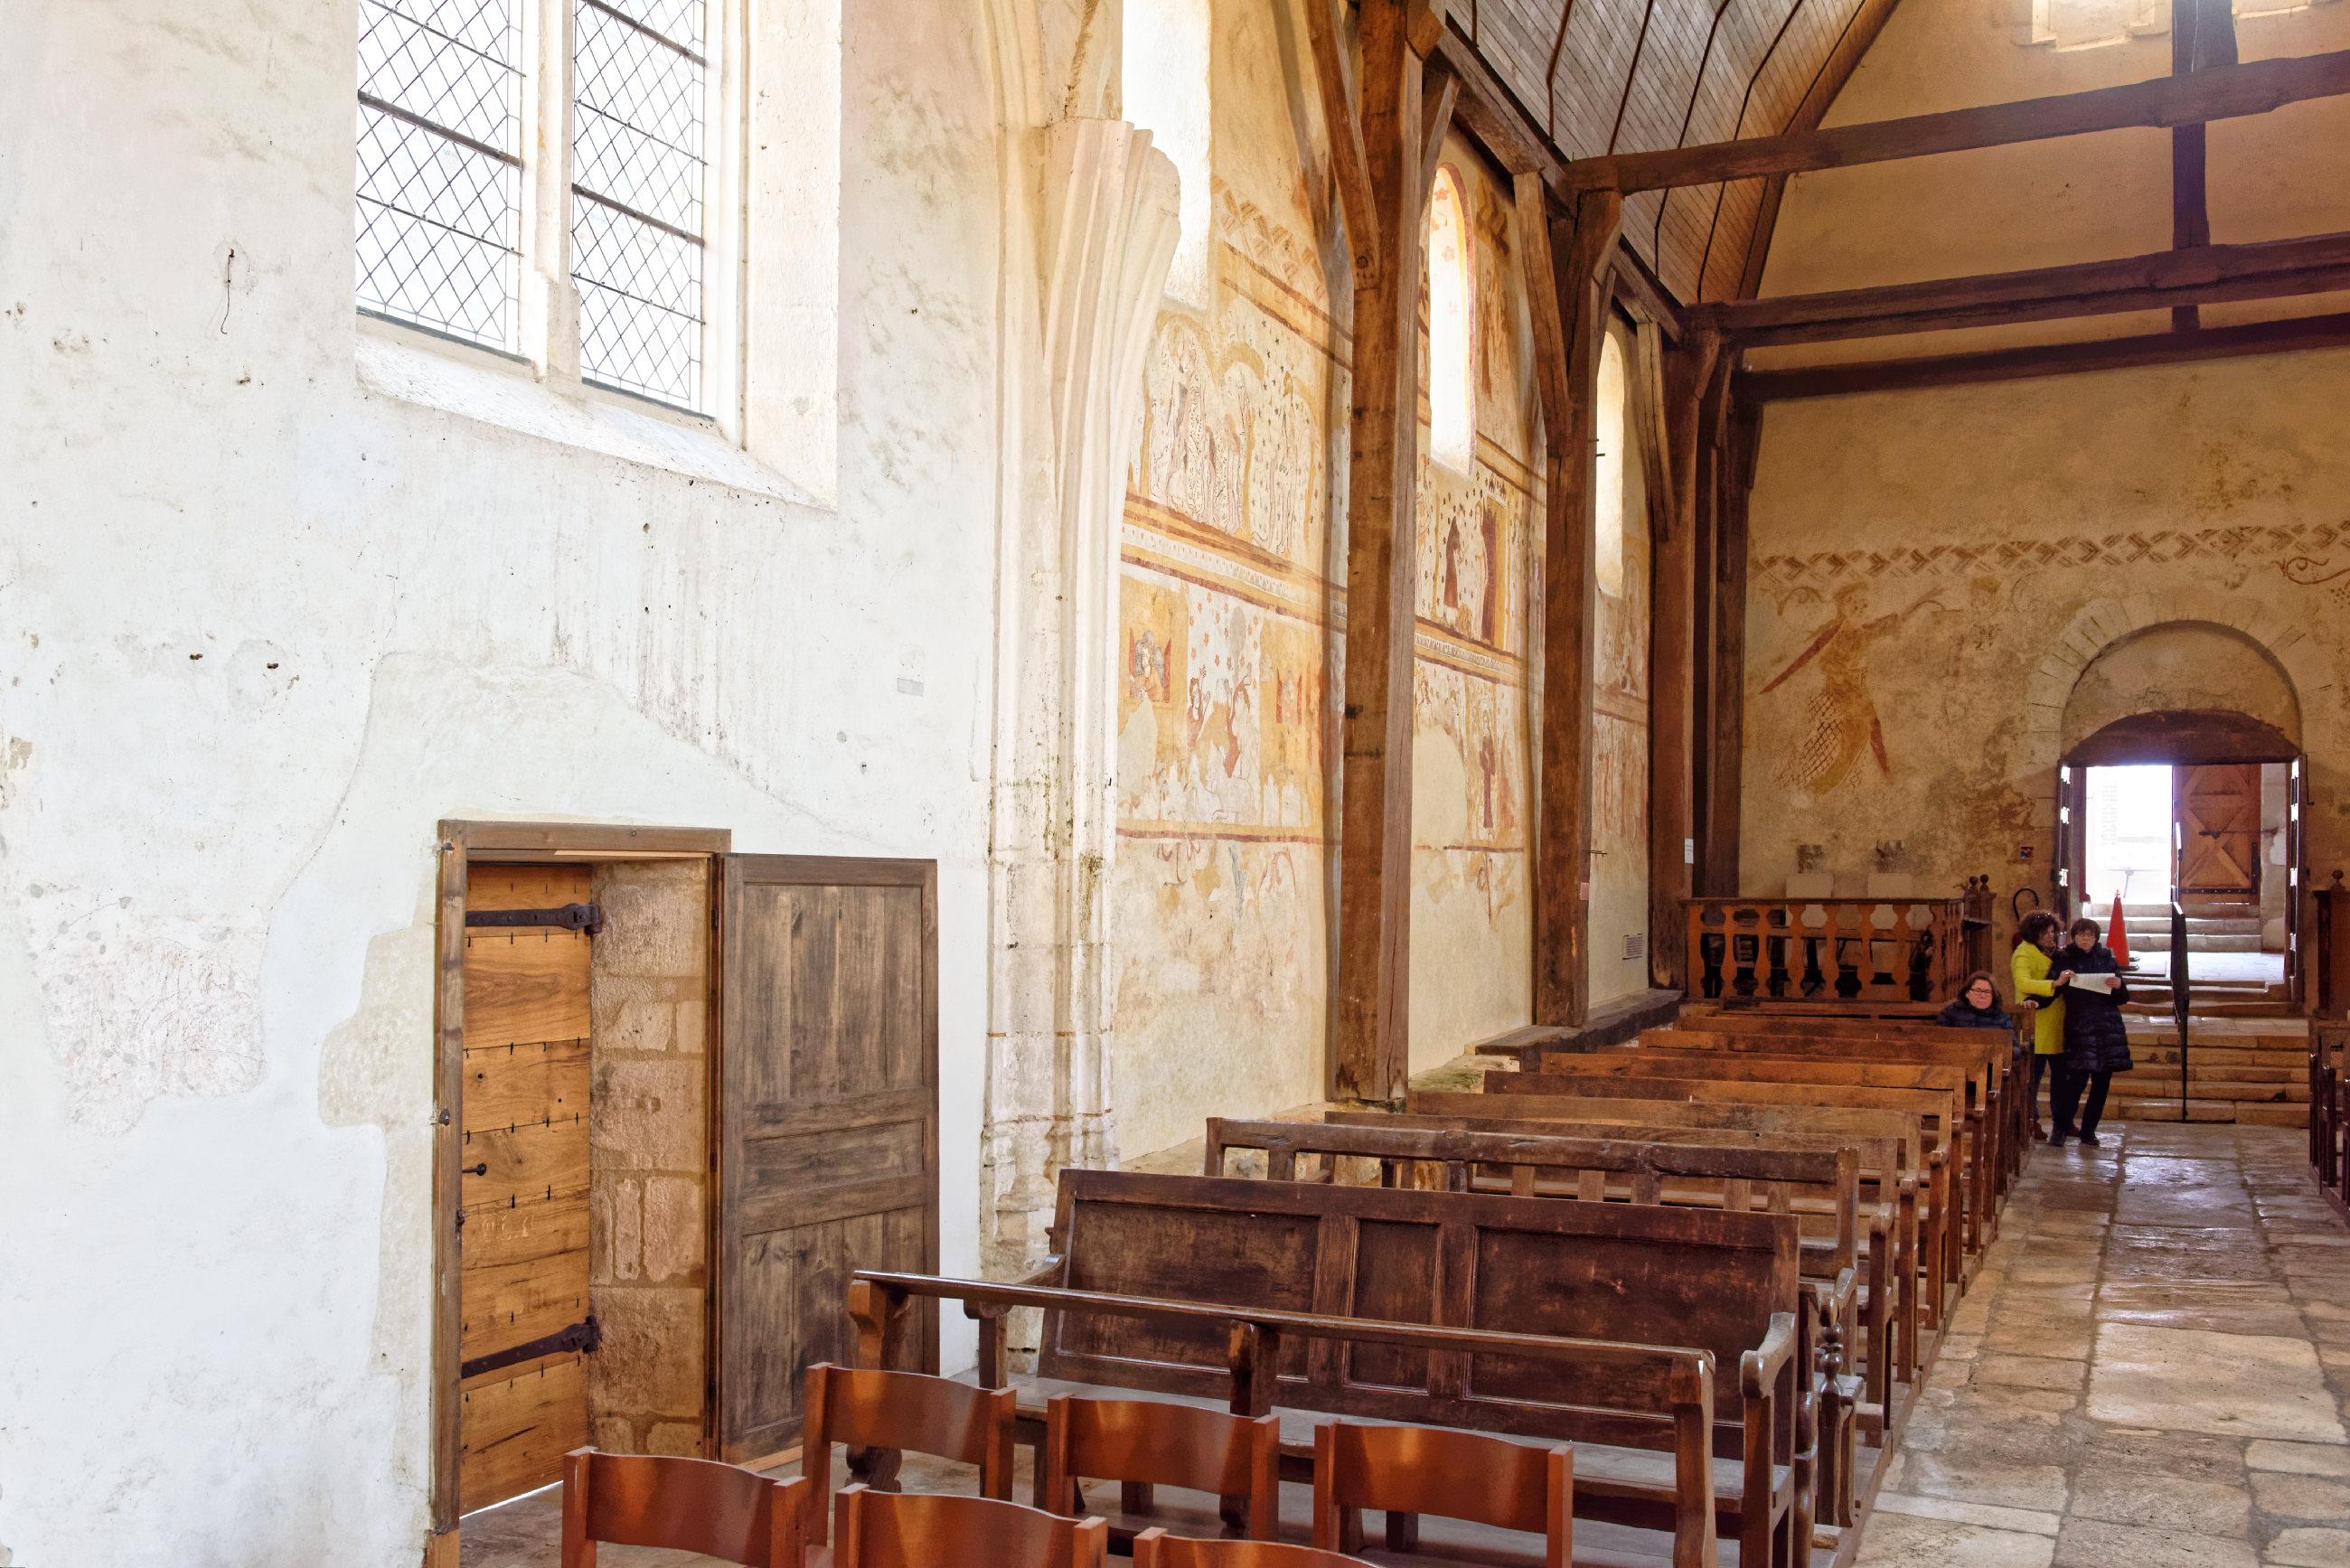 150405-Moutiers en Puisaye (42)